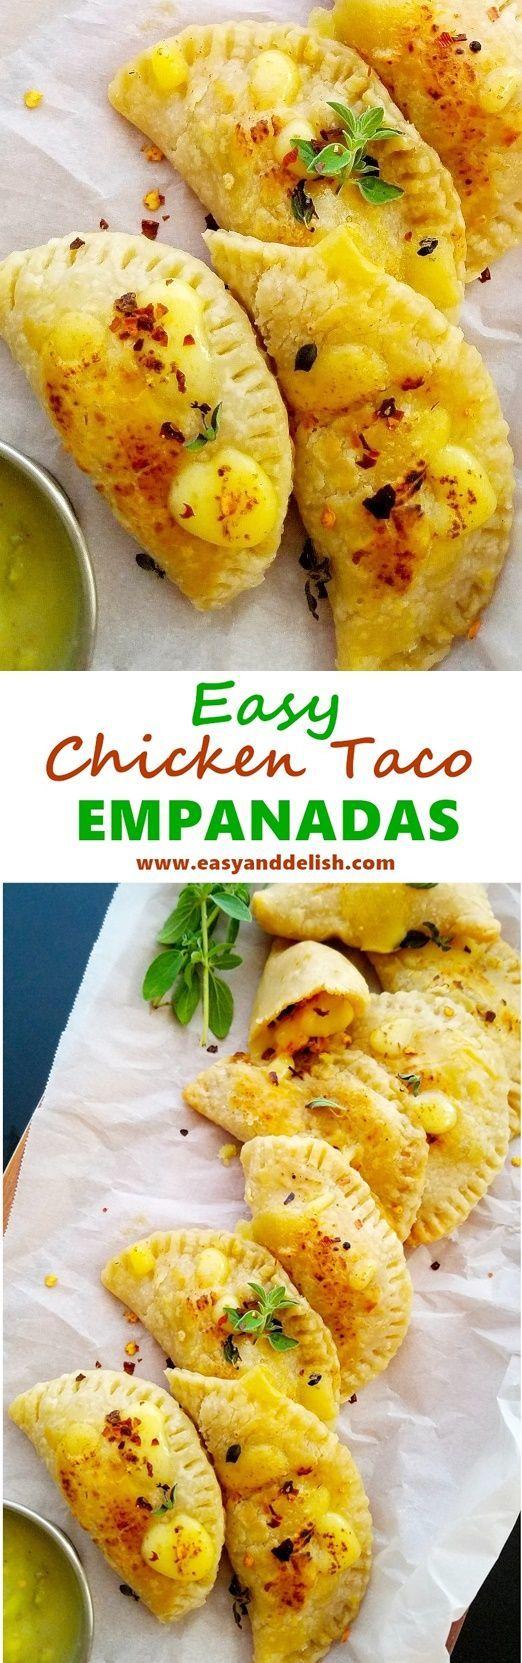 Easy Chicken Taco Empanadas to celebrate Fiesta, Cinco de Mayo, or for cocktail parties and sport games. So good!  #SoCu #ad #GoAutentico (good recipes taco)